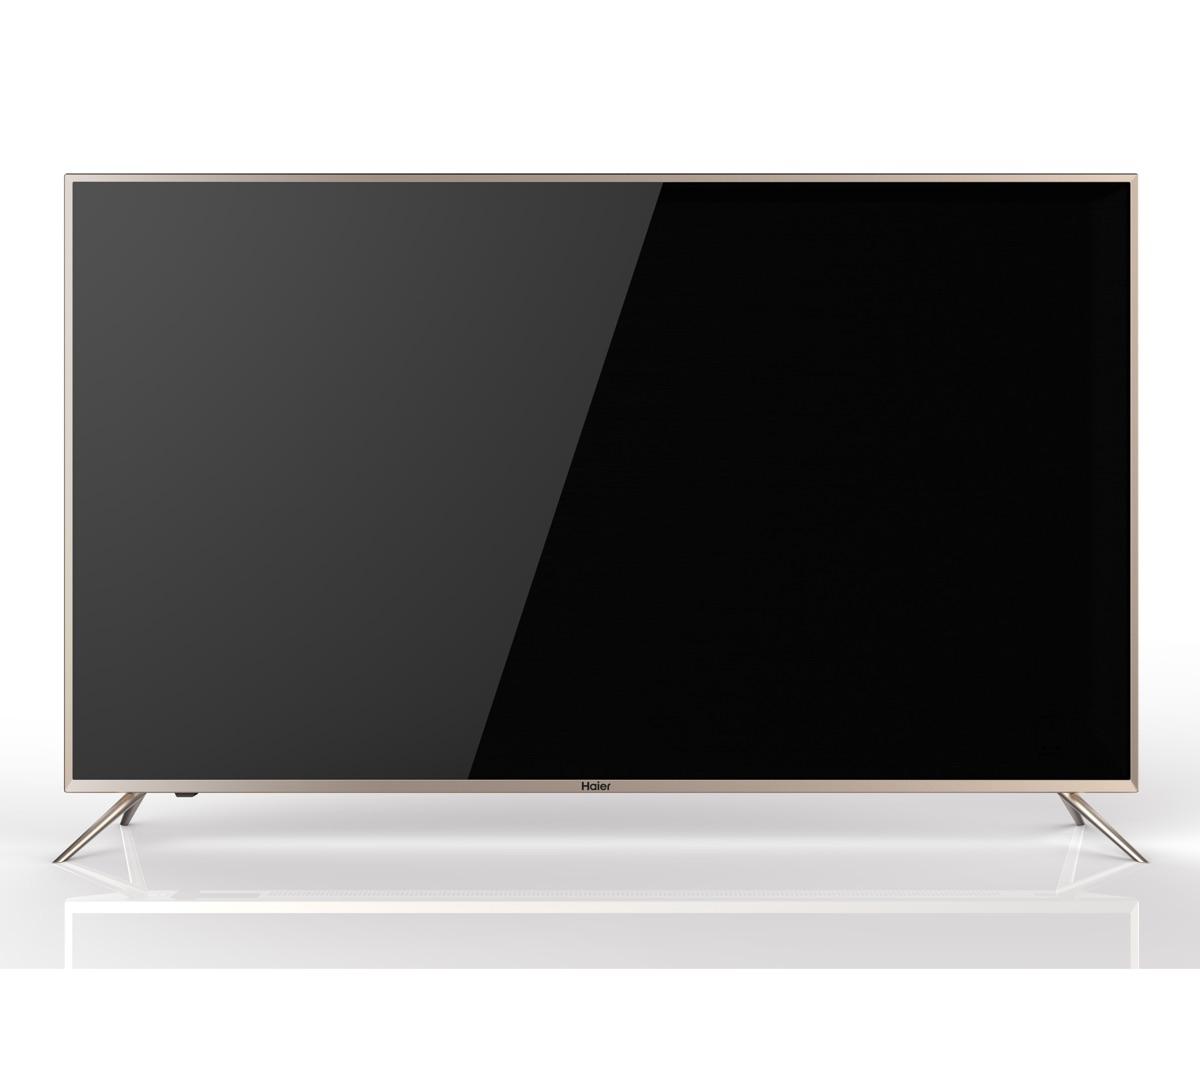 70d942d3326 Haier 55 4K Ultra HD LED Smart TV LE55U6500U In Pakistan